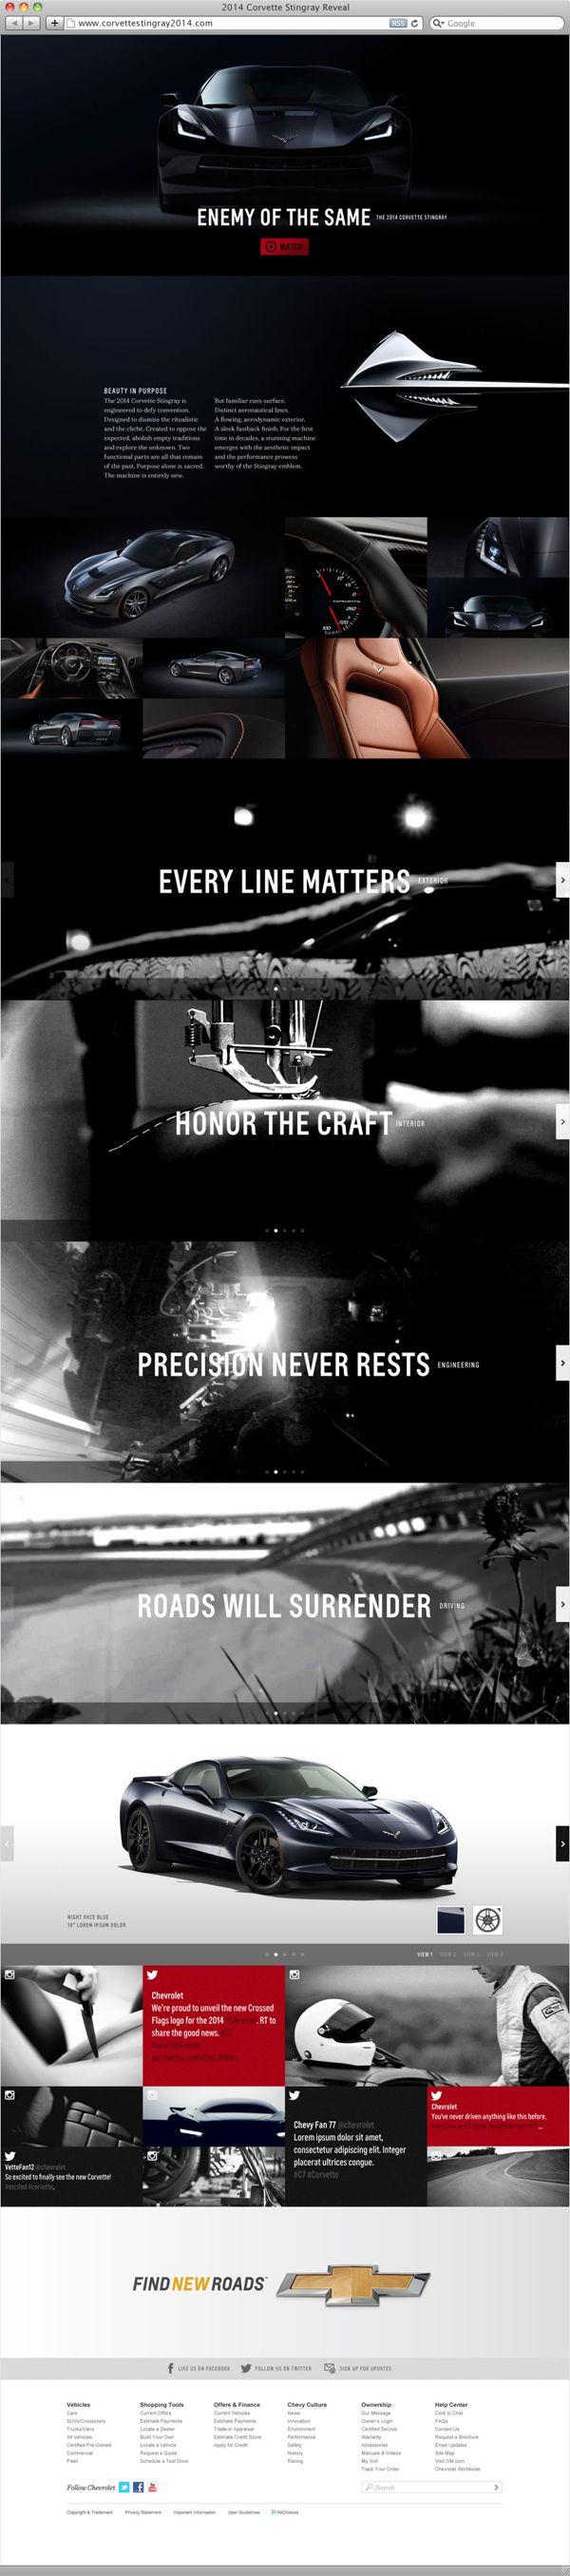 2014 Corvette Stingray Reveal by Ryan Ganss | #webdesign #it #web #design #layout #userinterface